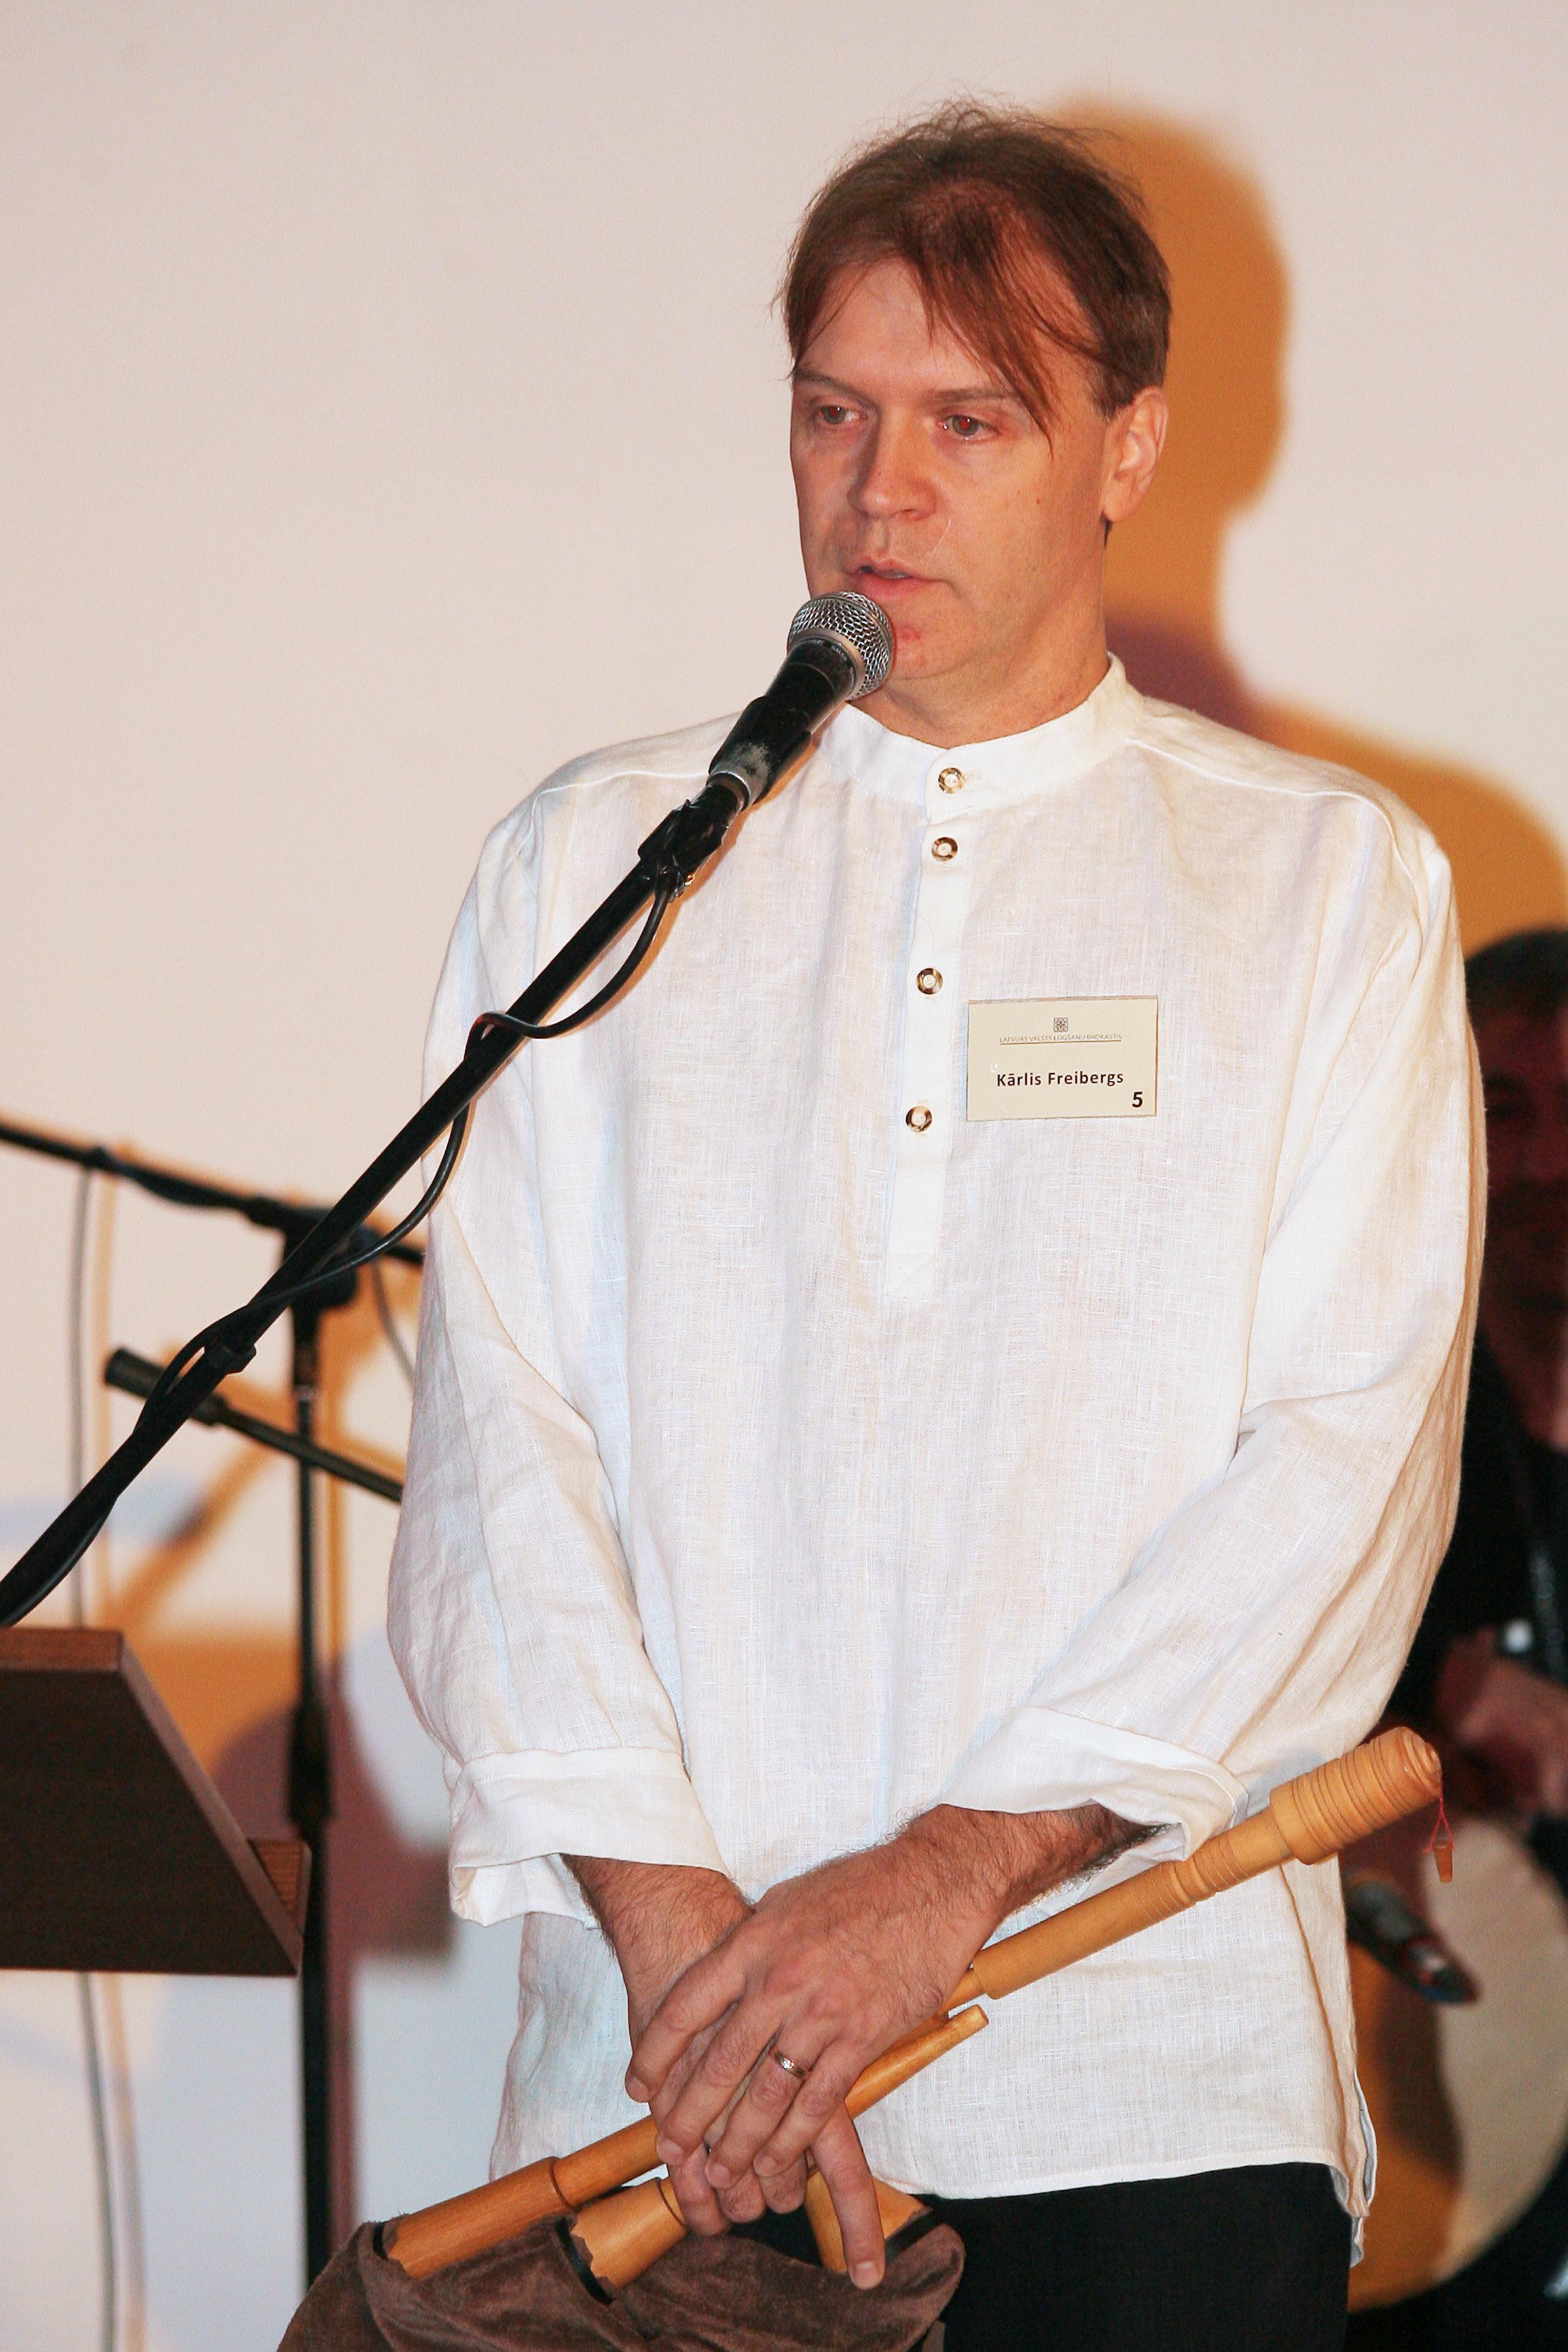 Kārlis Roberts Freibergs